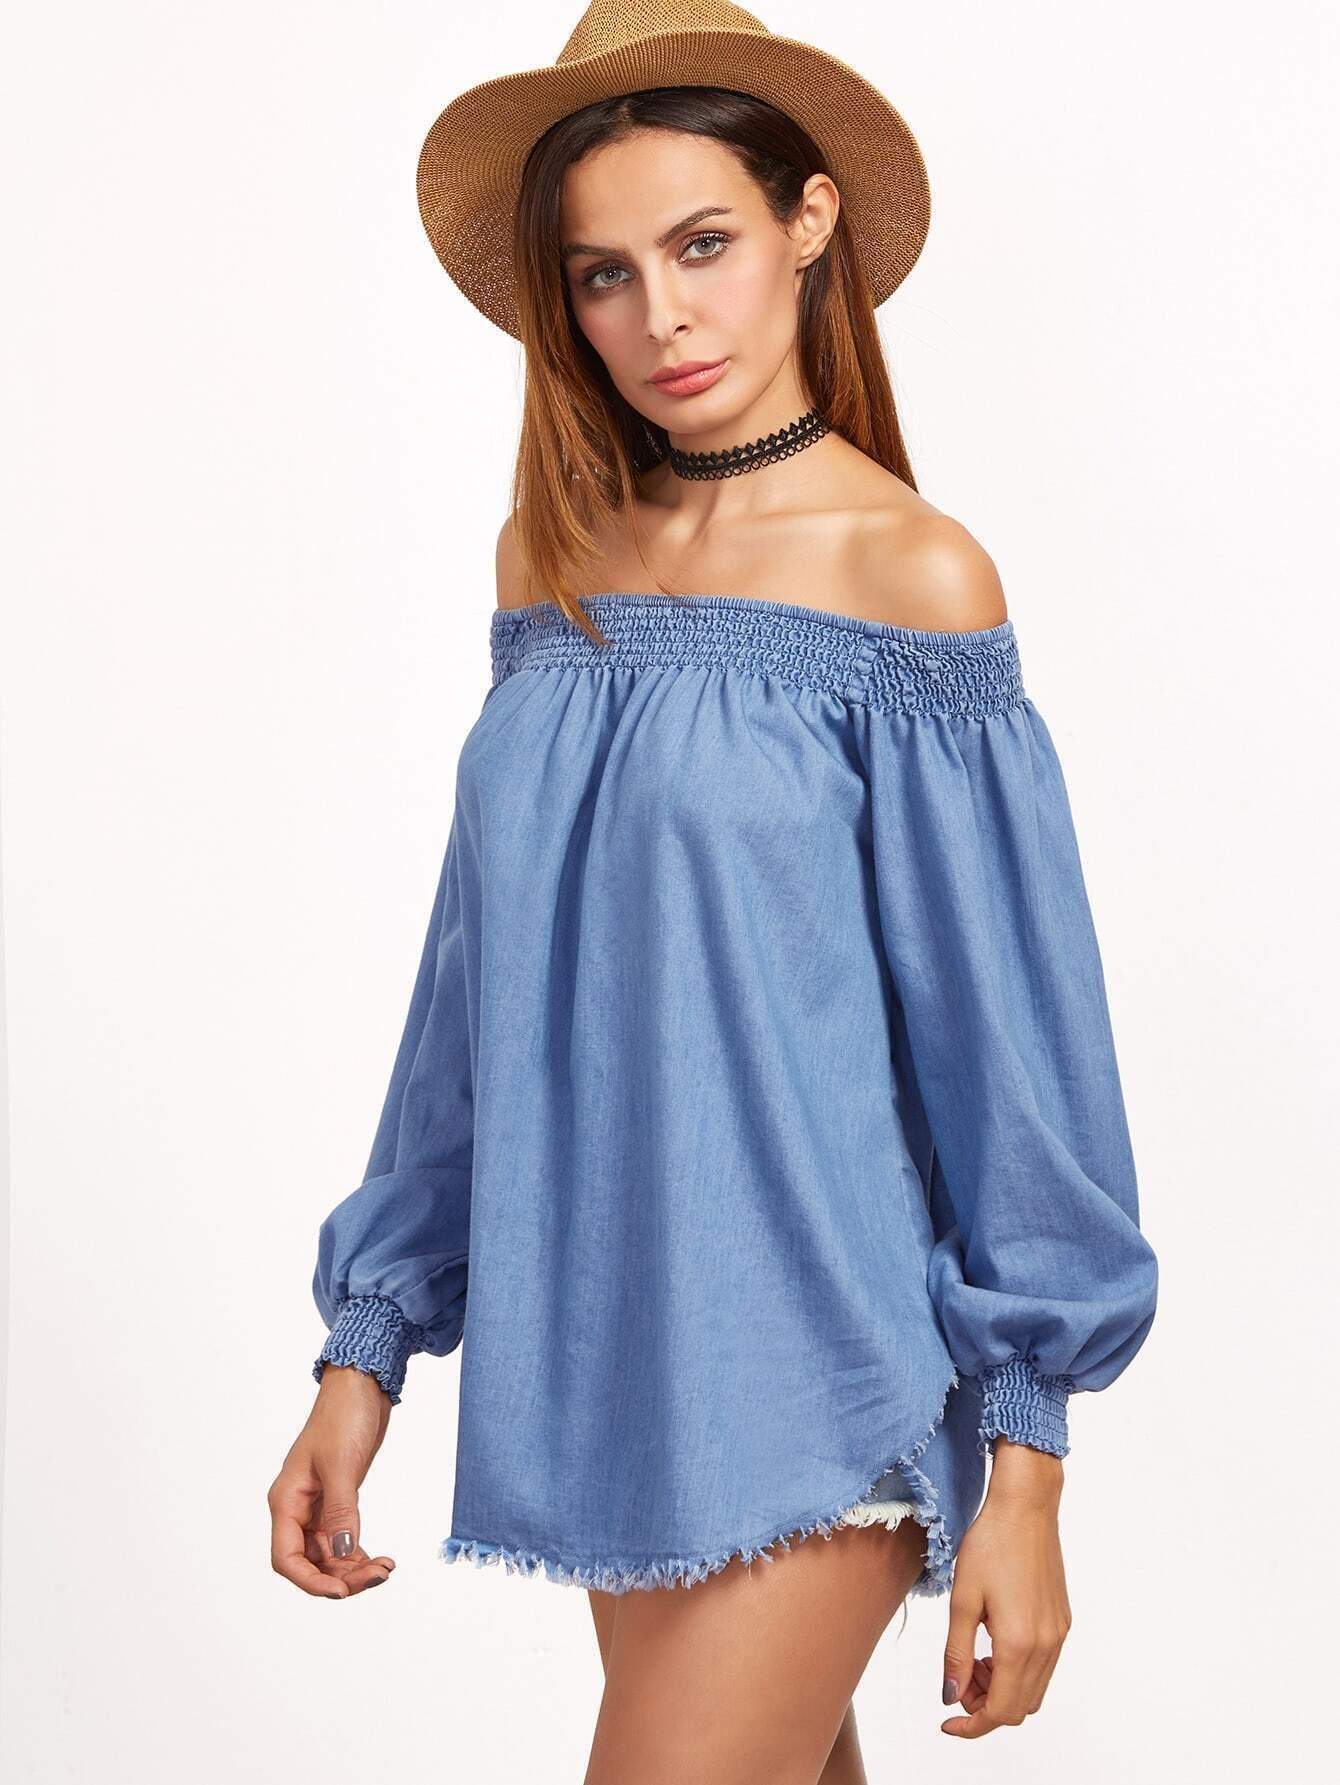 blouse161121599_2